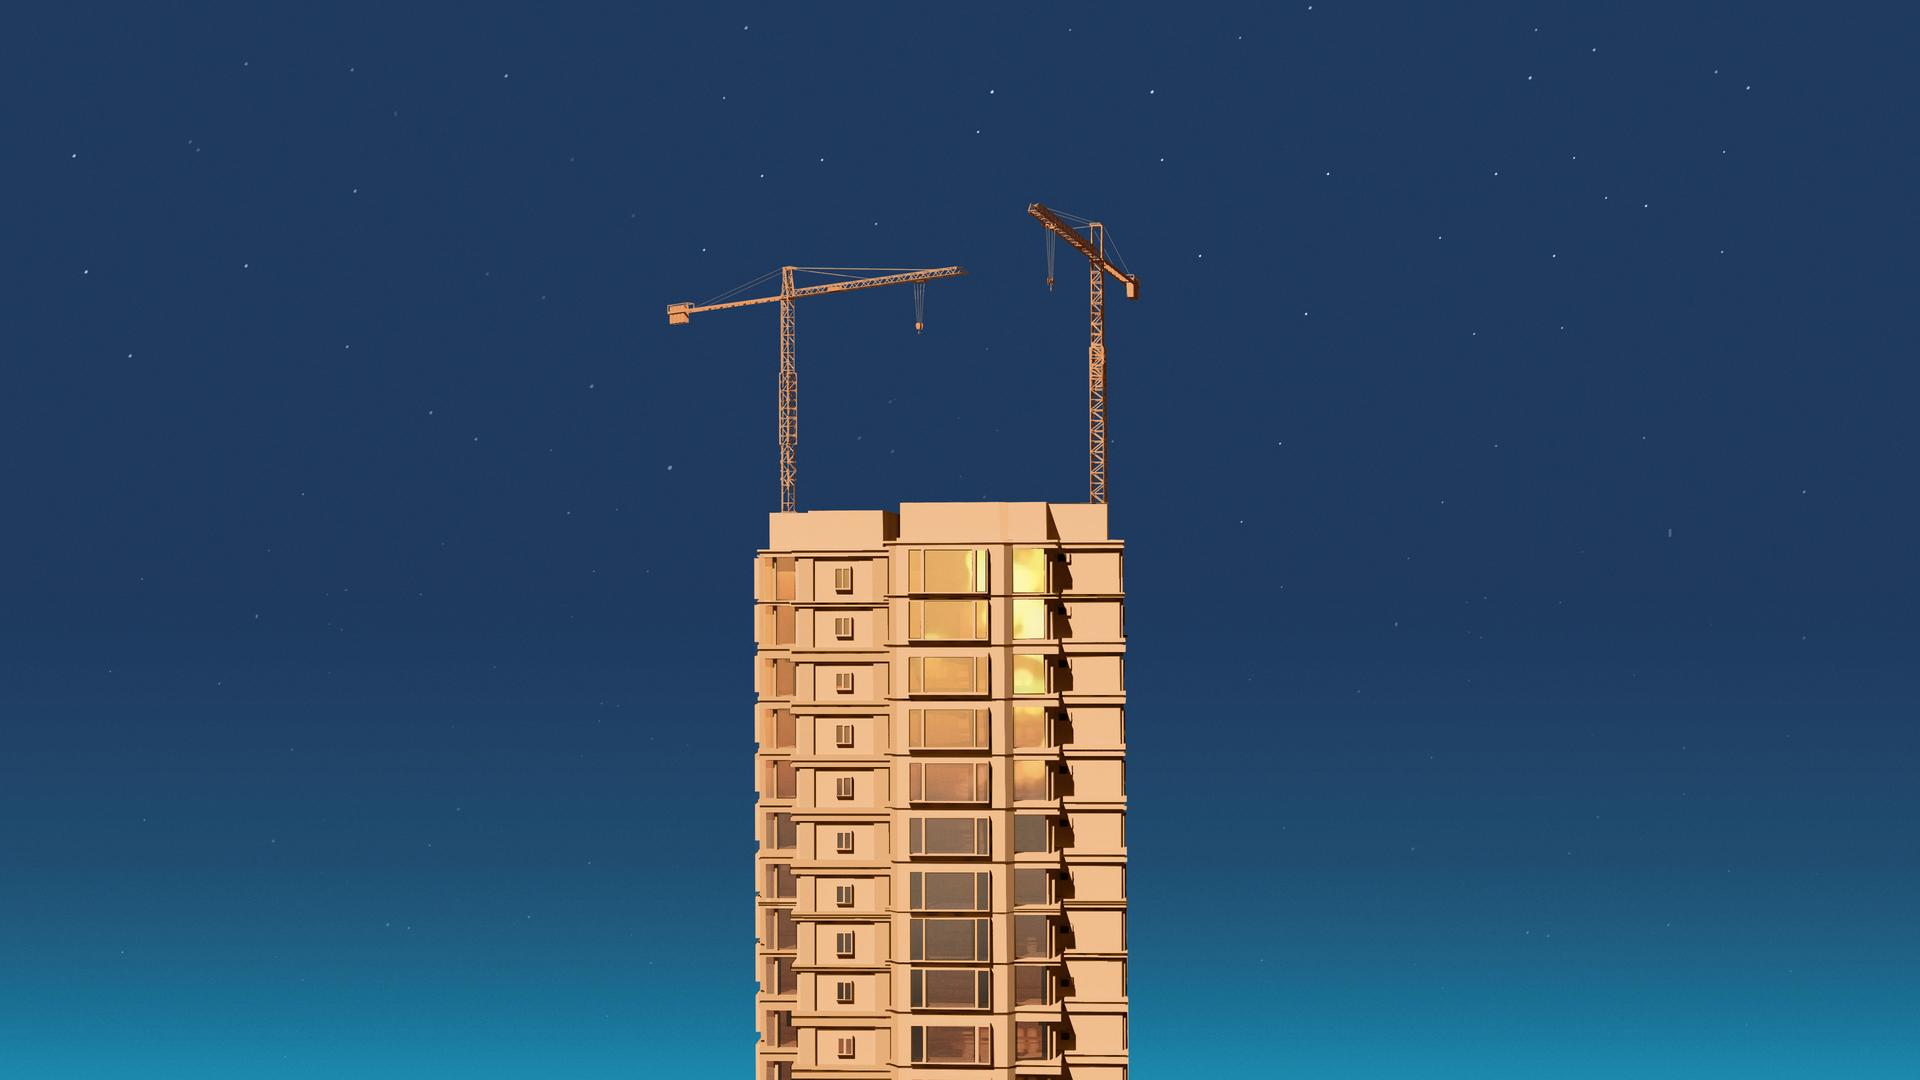 skyrise_render_02_orange.png